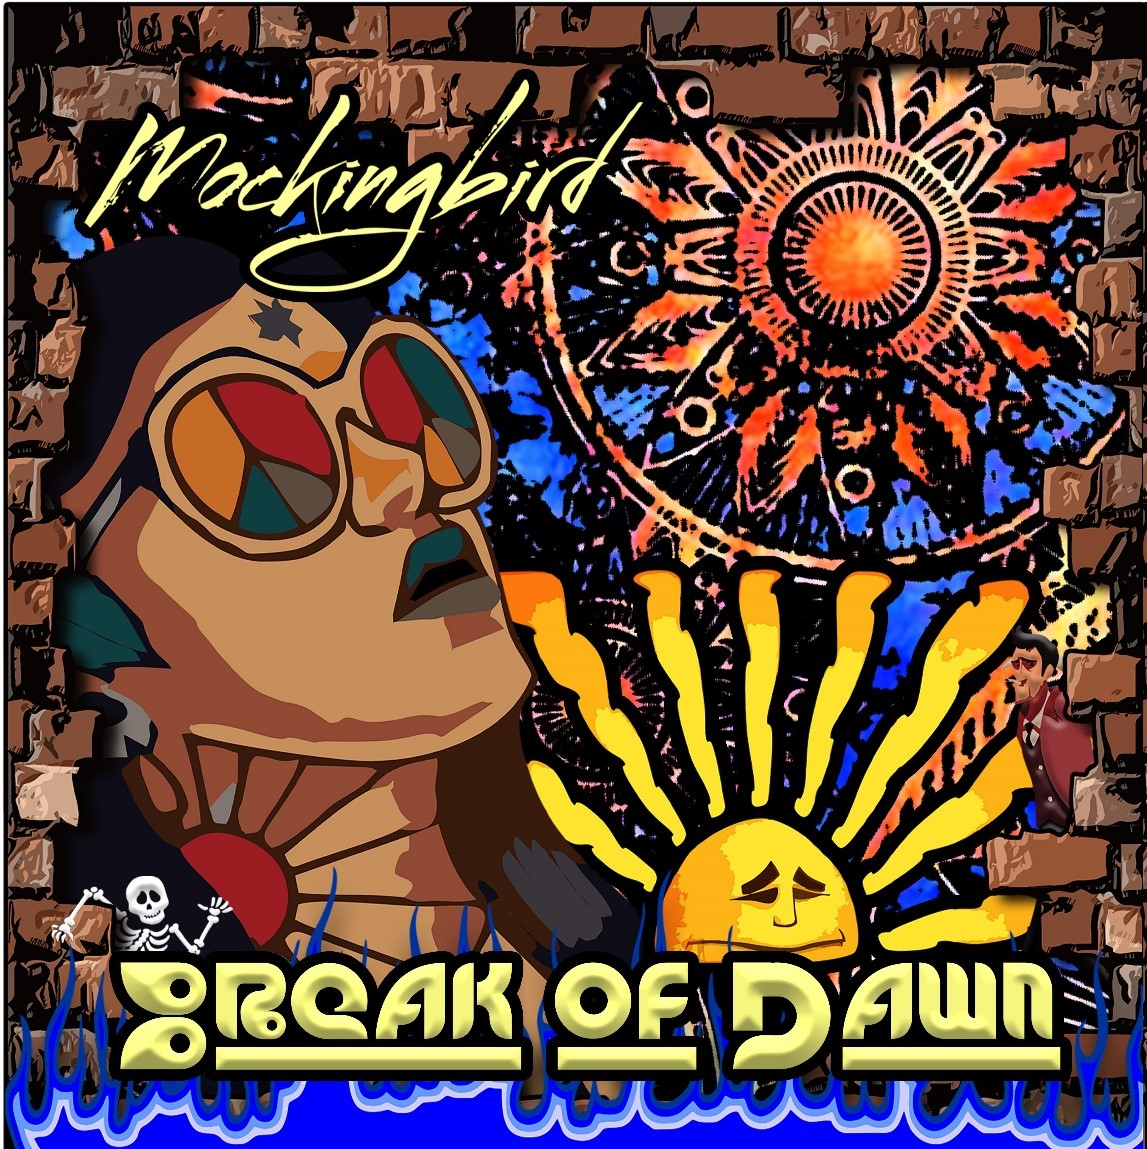 Mockingbird's 'Break of Dawn' - The Newest Edition to Americana Rock